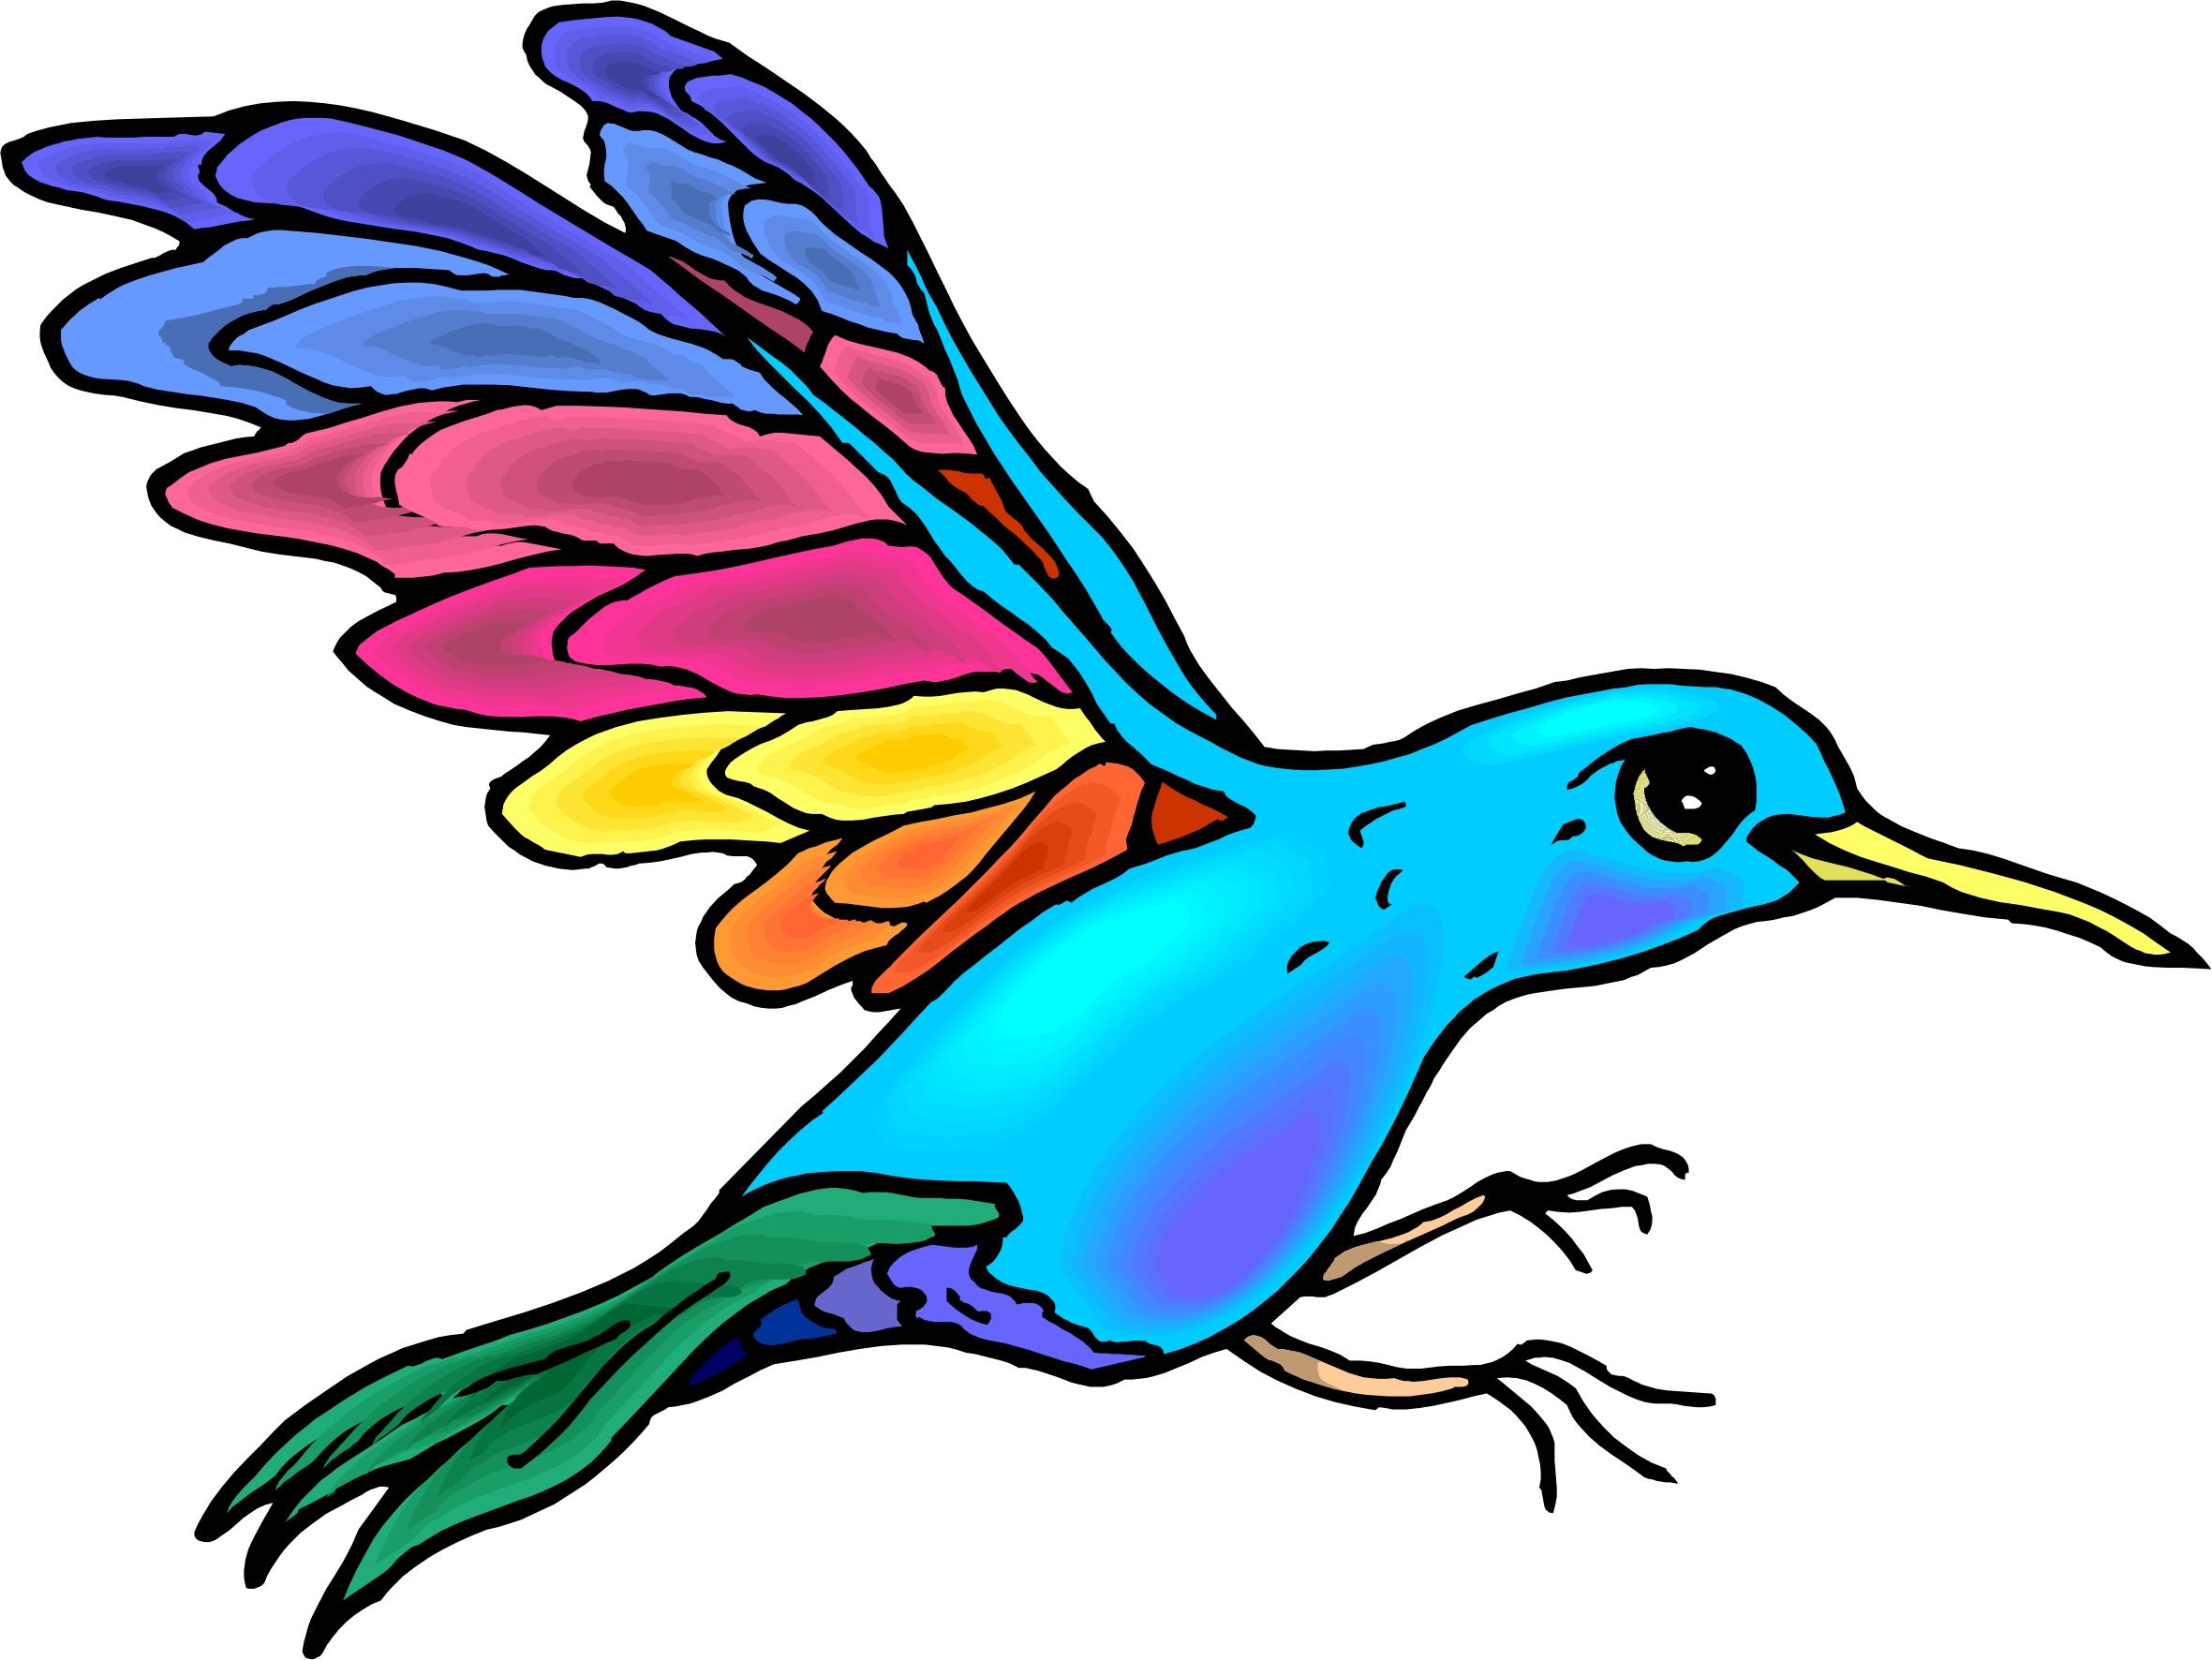 cartoon bird simple photo - photo #32